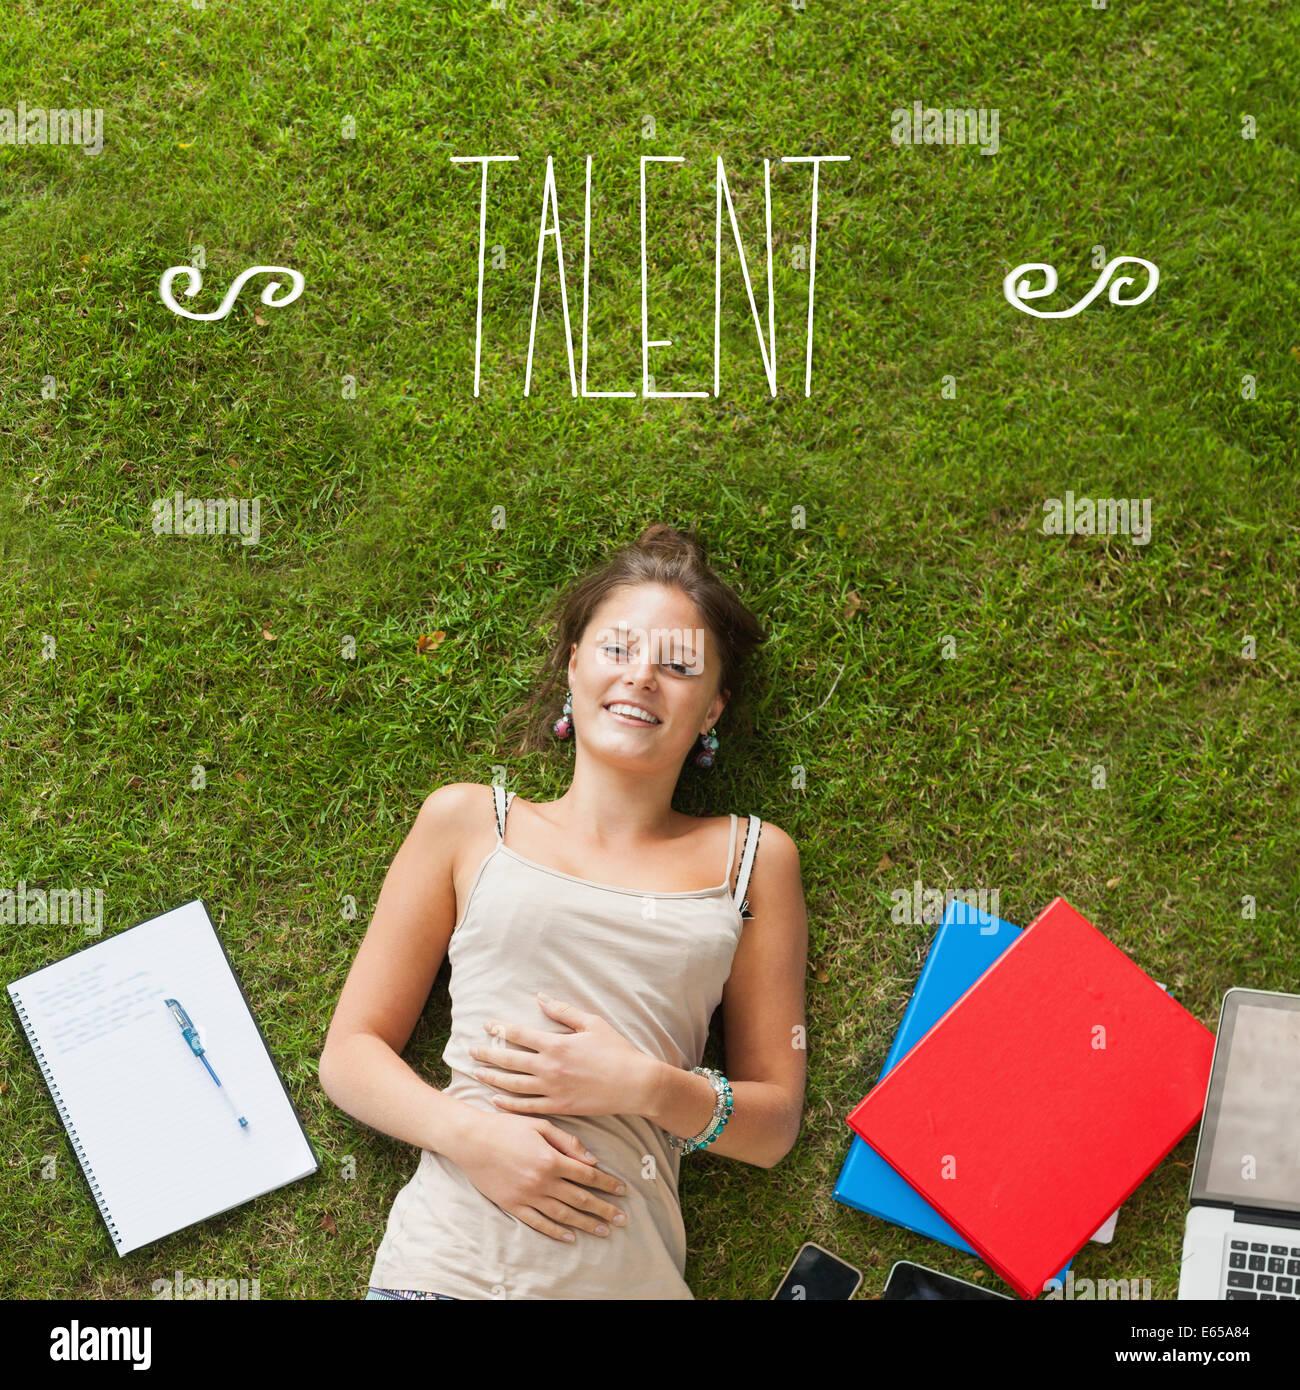 Talent gegen hübsche Studentin liegen auf dem Rasen Stockbild